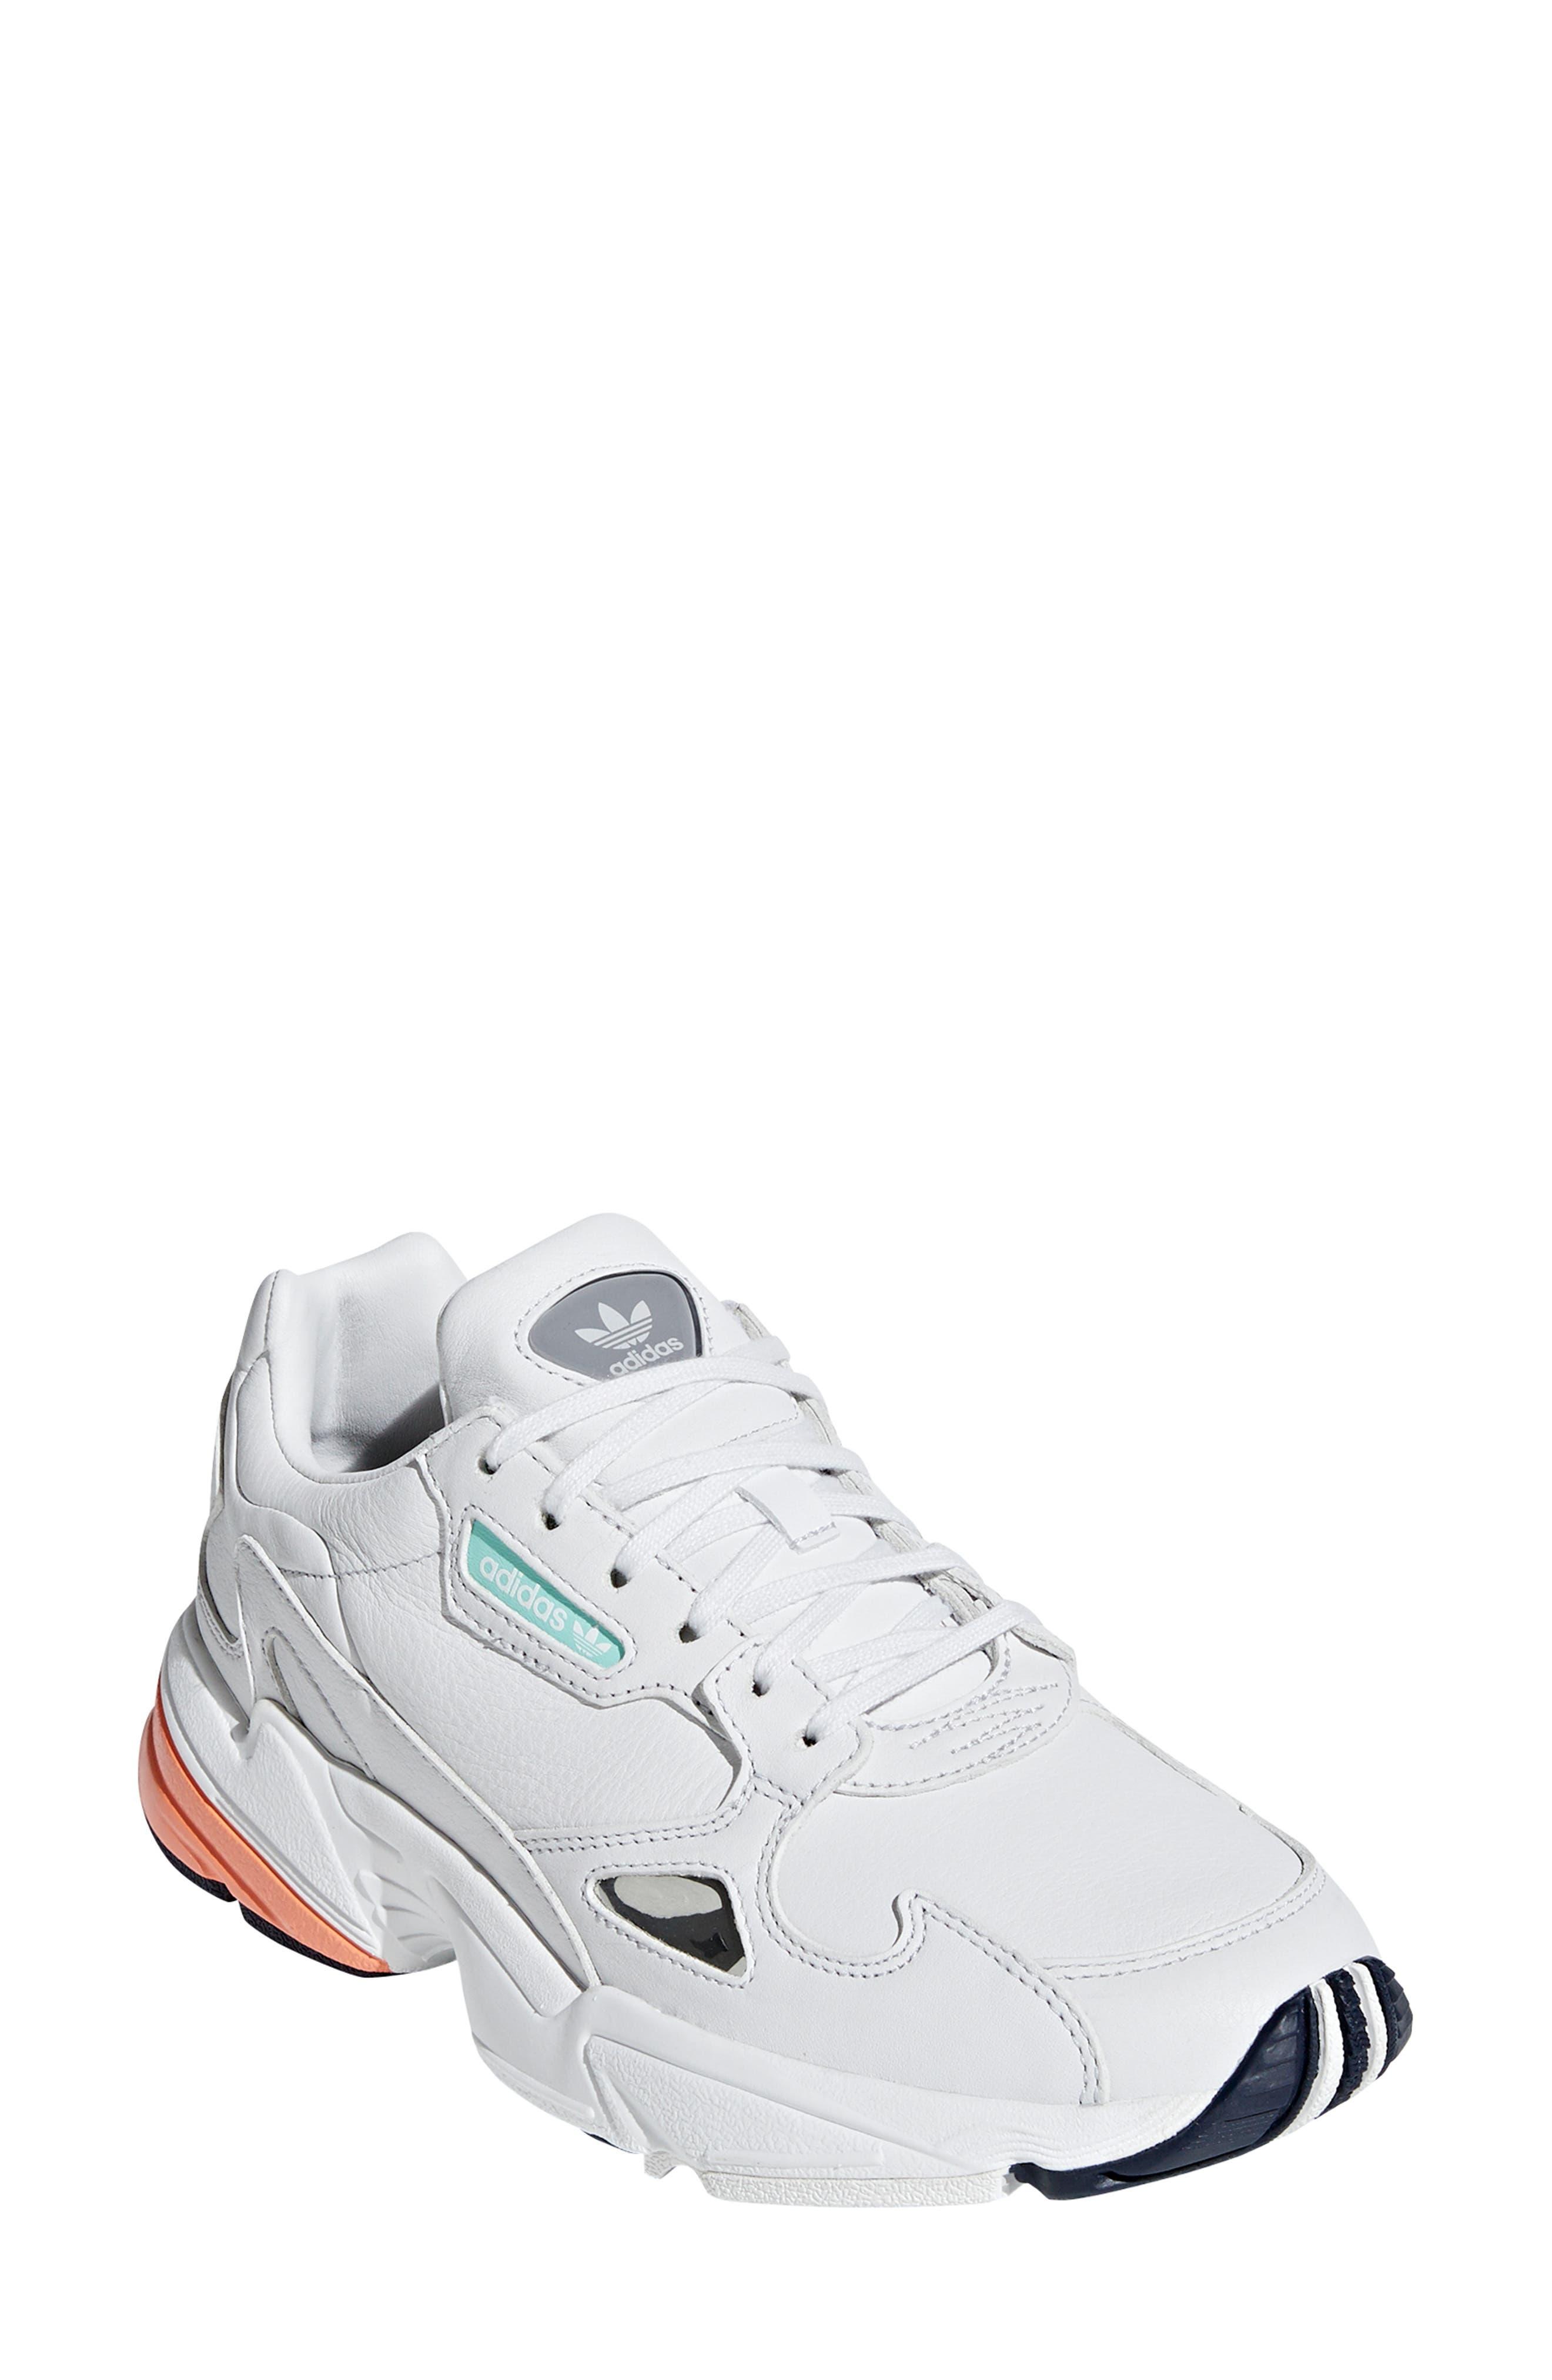 Falcon Sneaker,                         Main,                         color, CRYSTAL WHITE/ EASY ORANGE